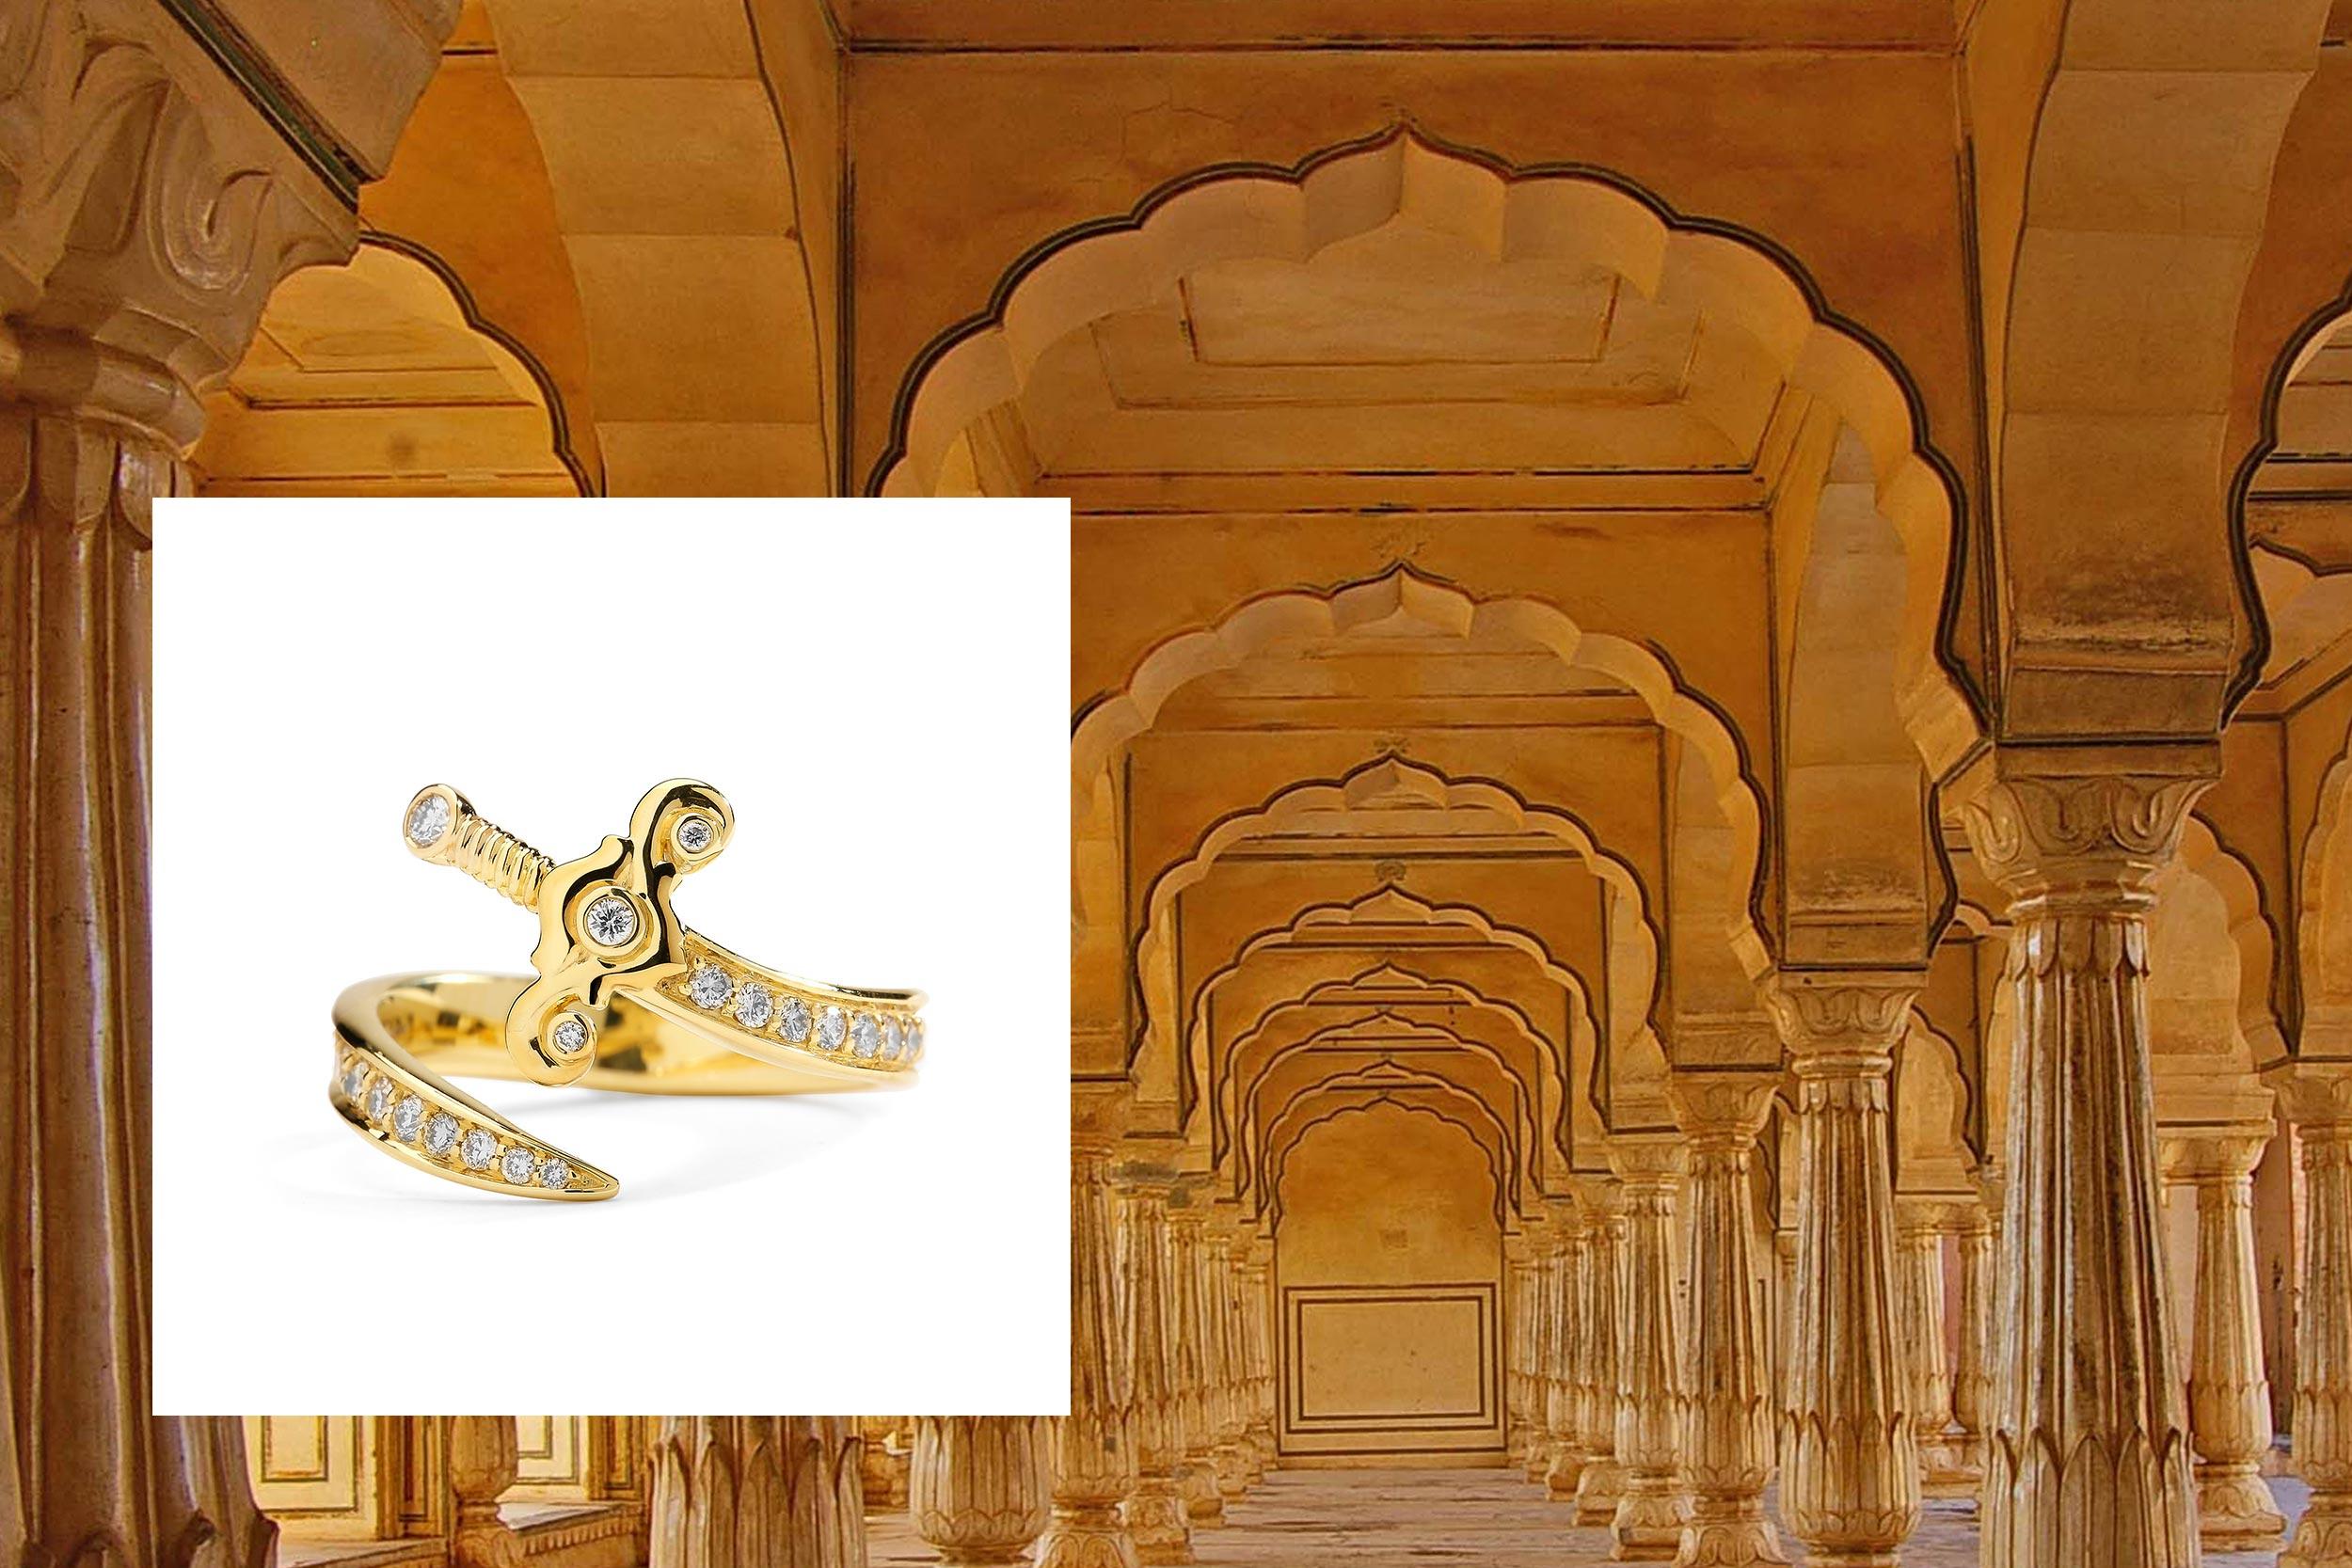 18kyg mogul sword ring with champagne diamonds